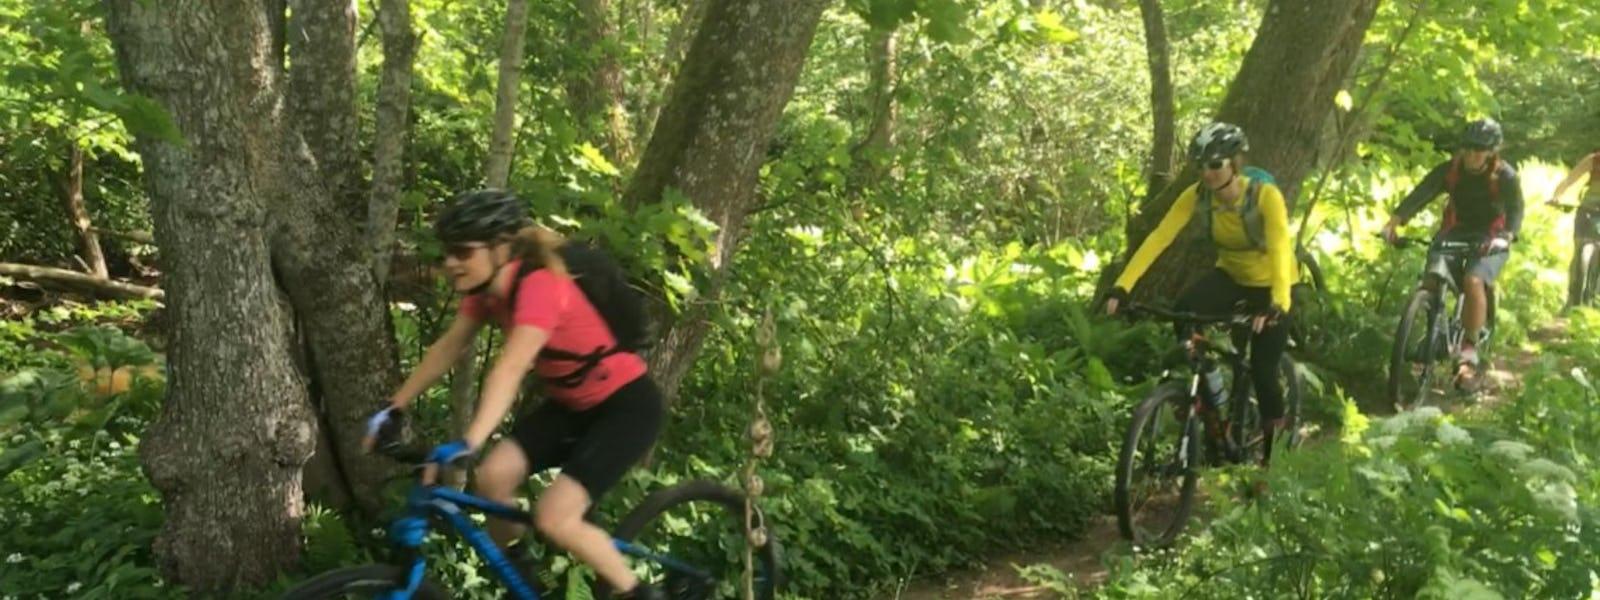 Bild - Guidad Mountainbike-upplevelse för nybörjare